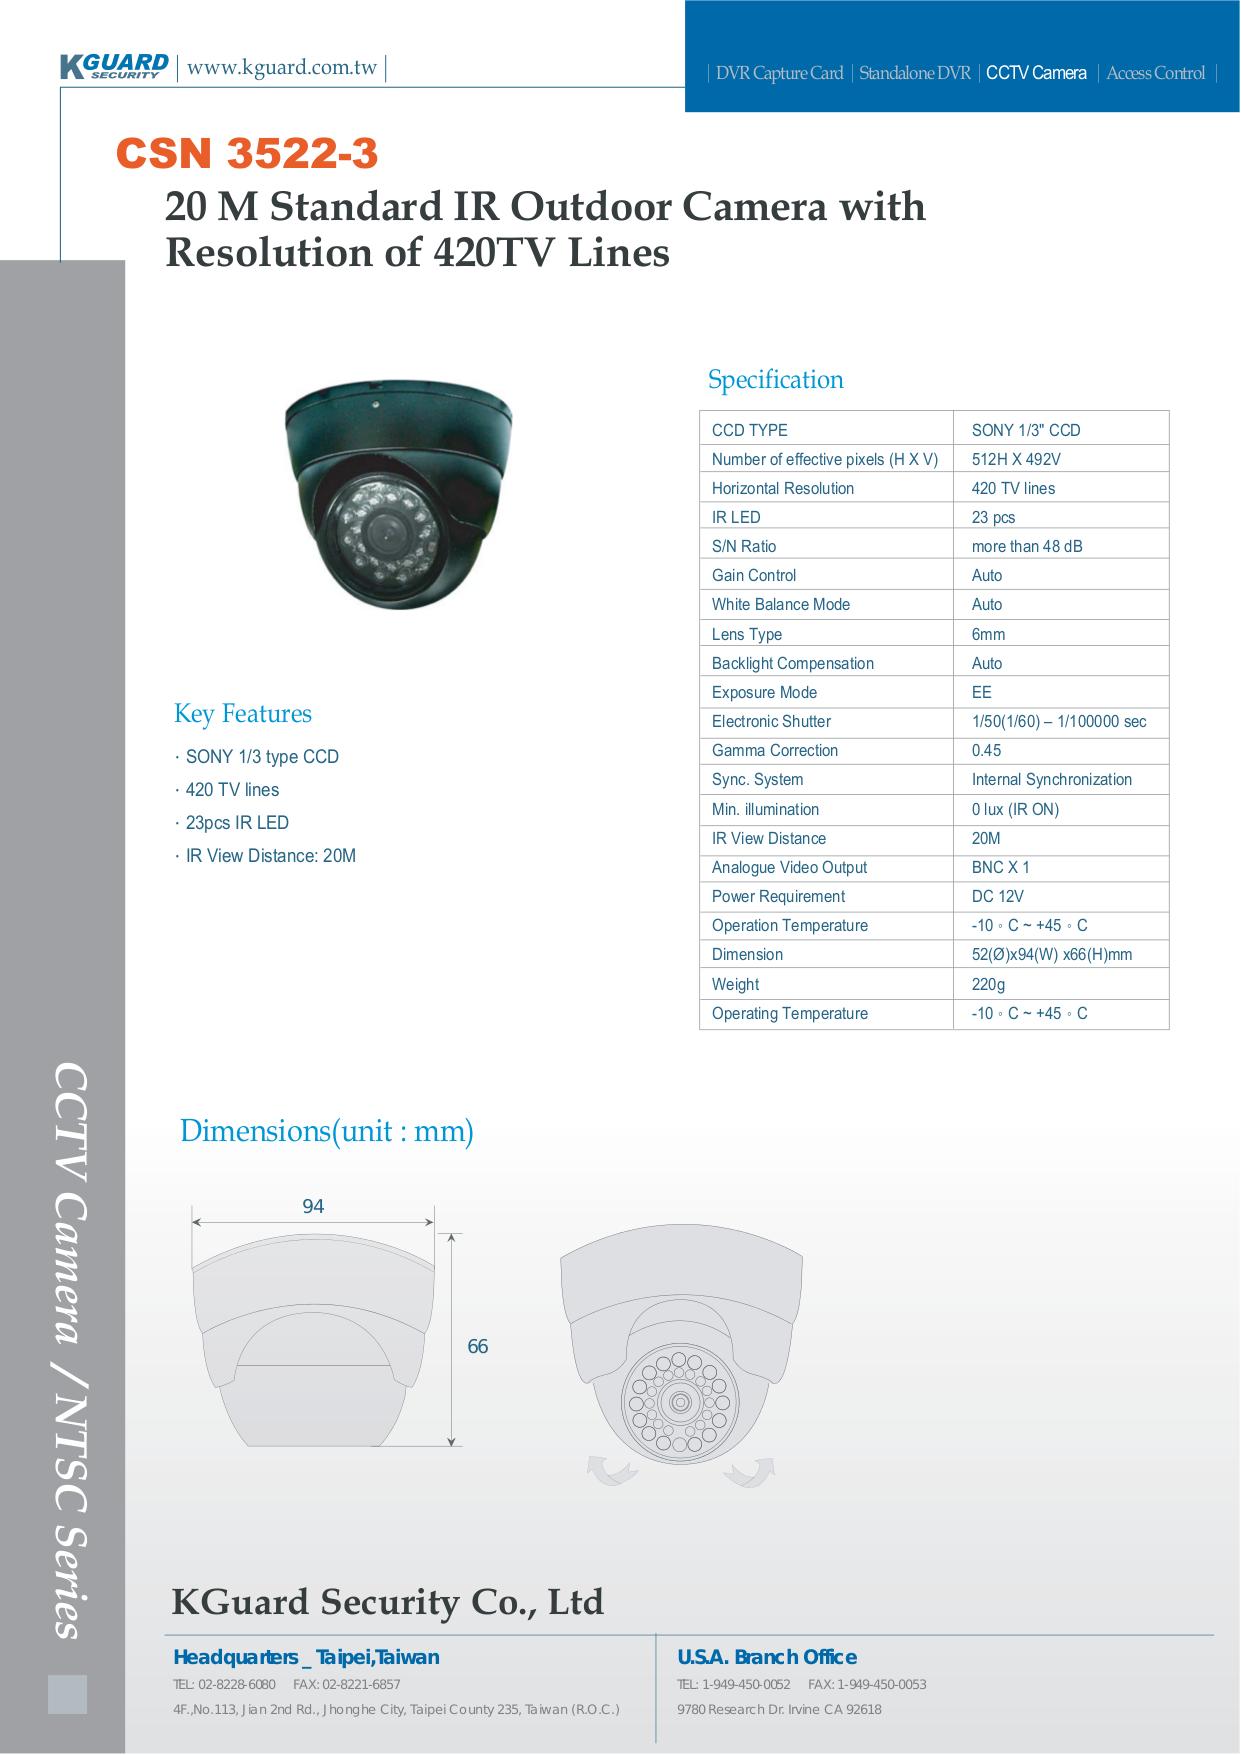 pdf for Kguard Security Camera CSN-3522-3 manual